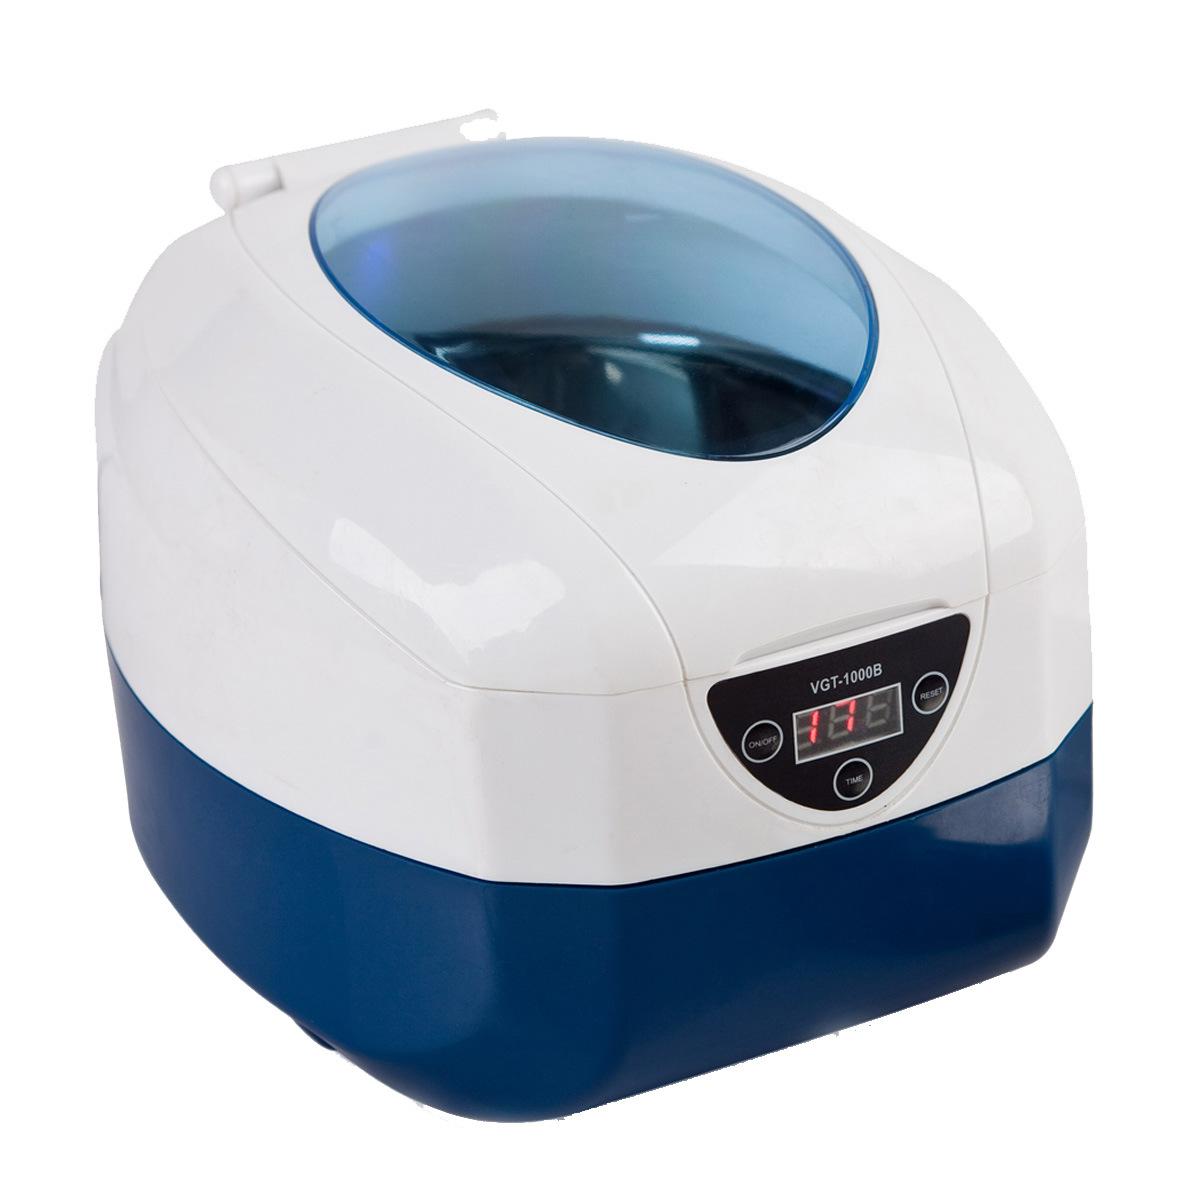 Ultrasonic CD Cleaner 1000B